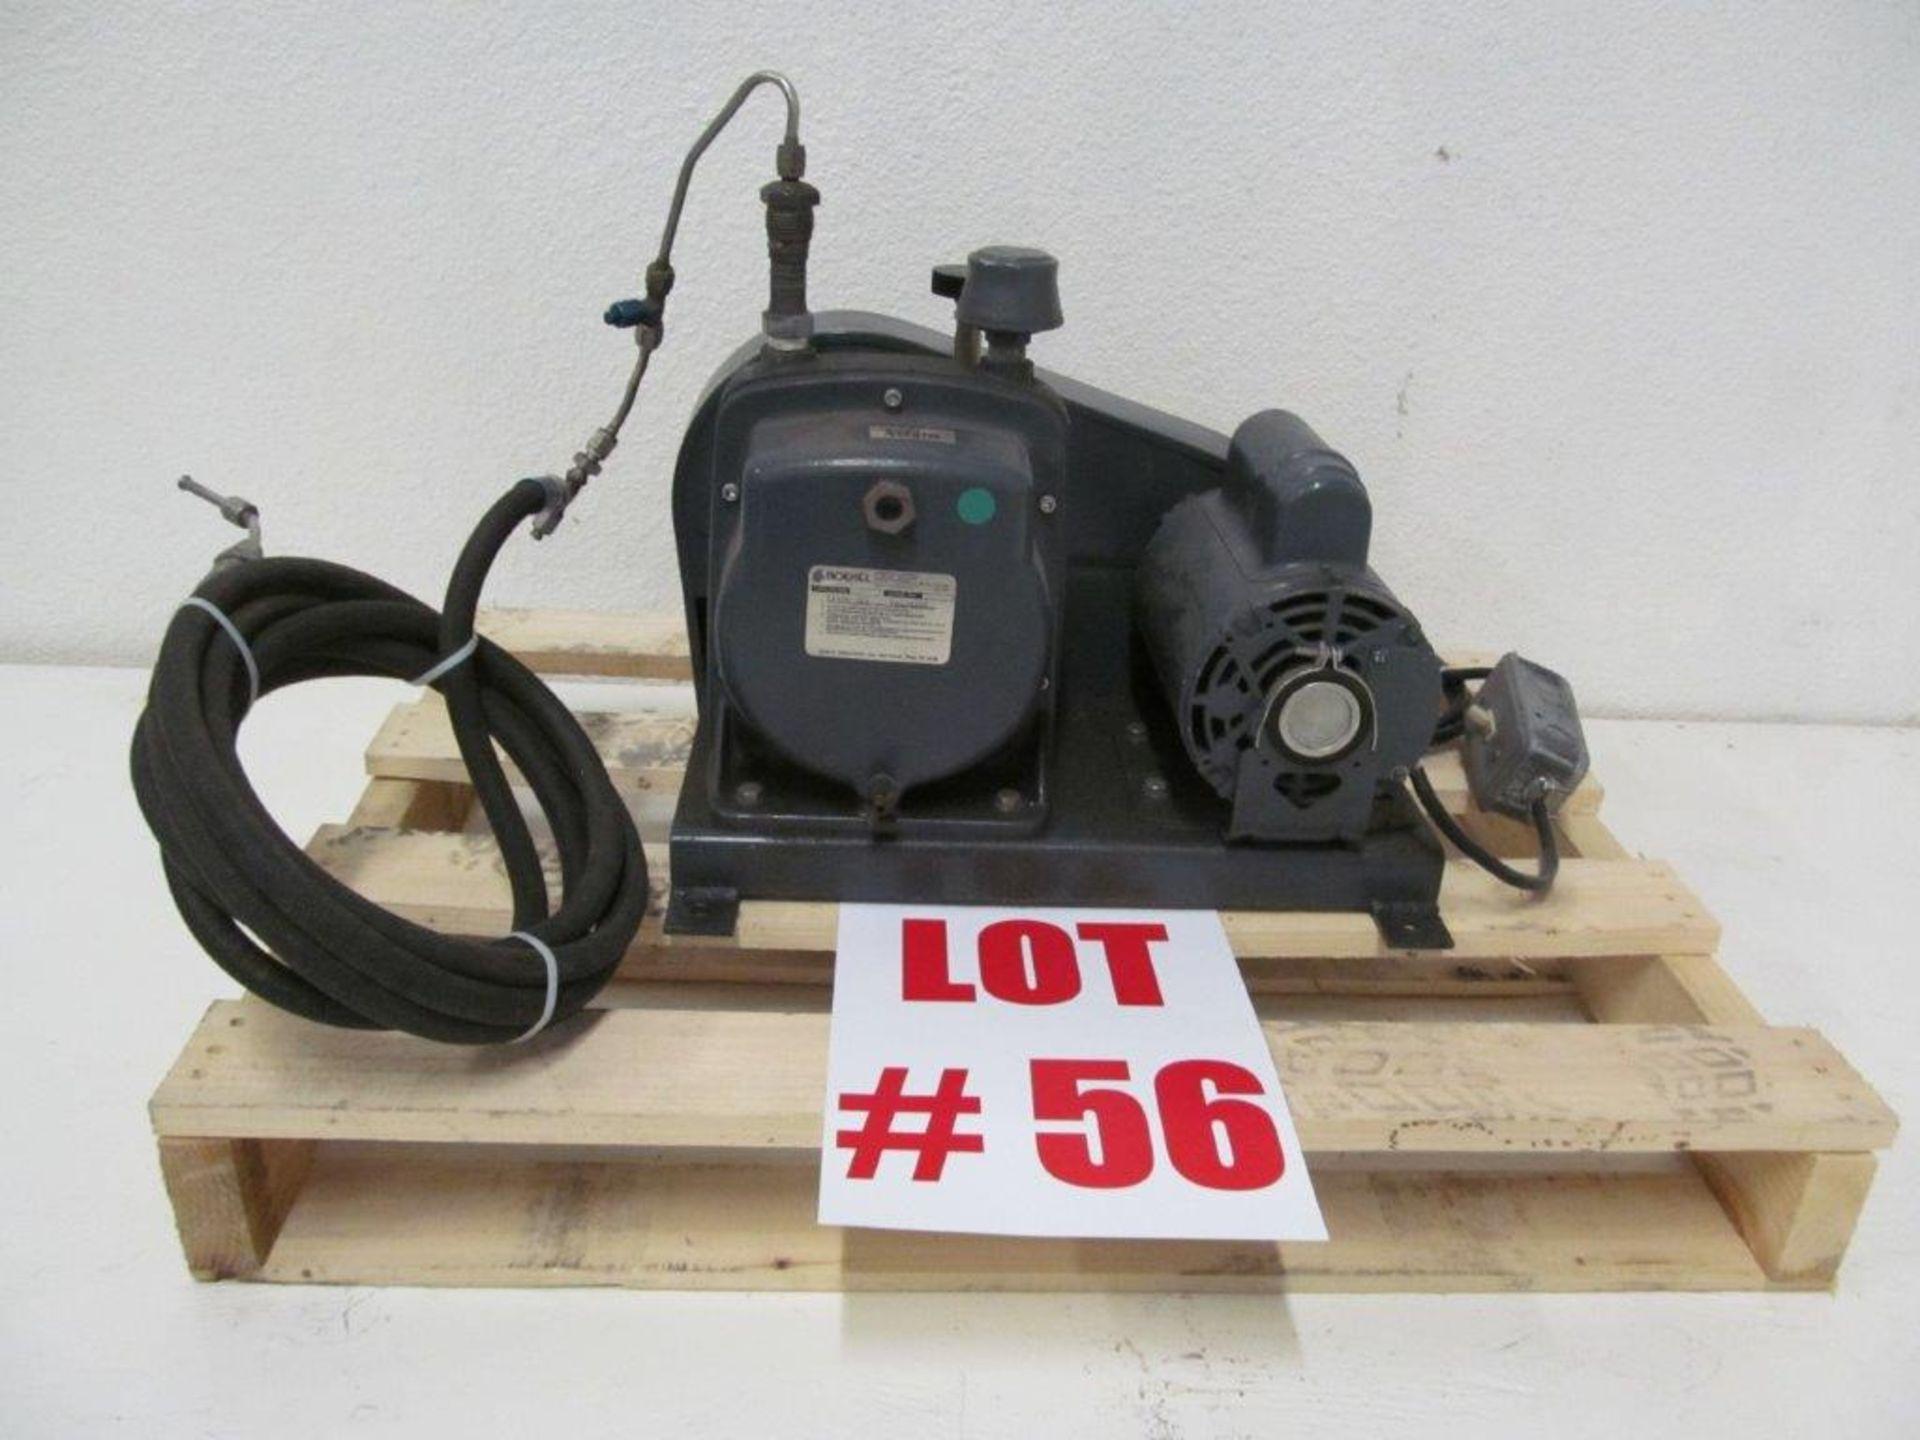 Lot 56 - BOEKEL HYVAC VACUUM PUMP, CAT#91506, S/N 05239008, 115V/230V/1PH/60C. 1/2HP - LOCATION,